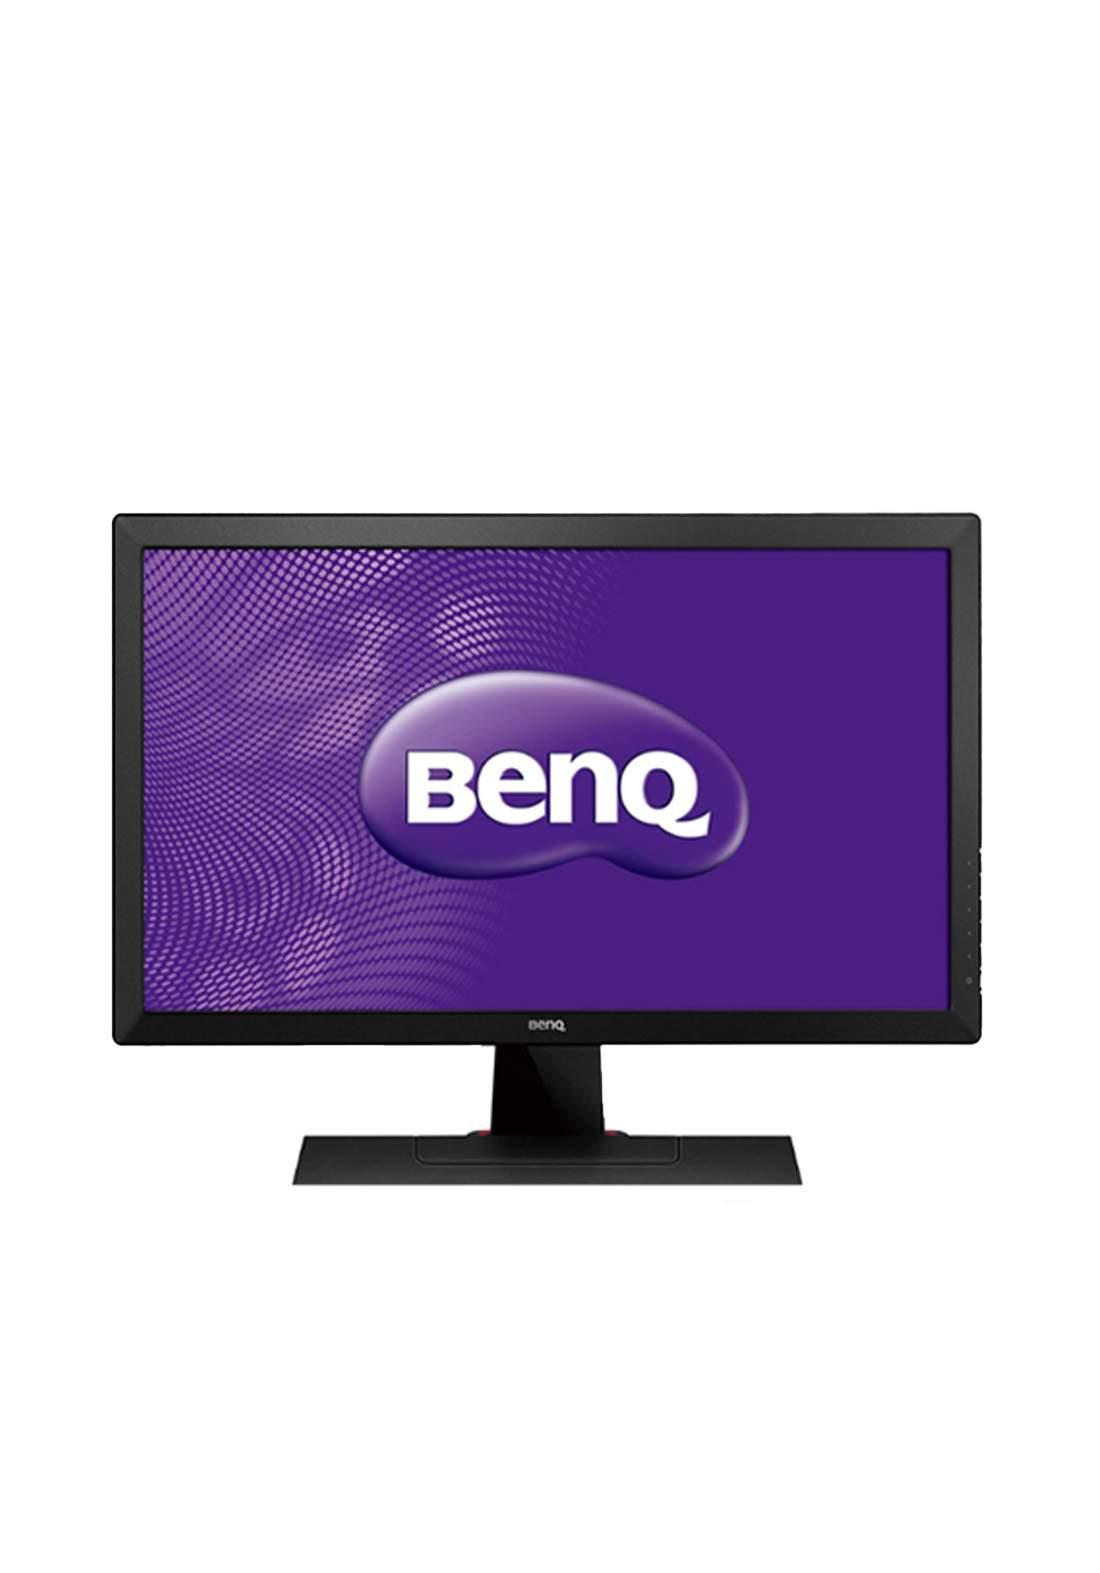 BenQ GW2455H FHD LED Monitor 24 - Black